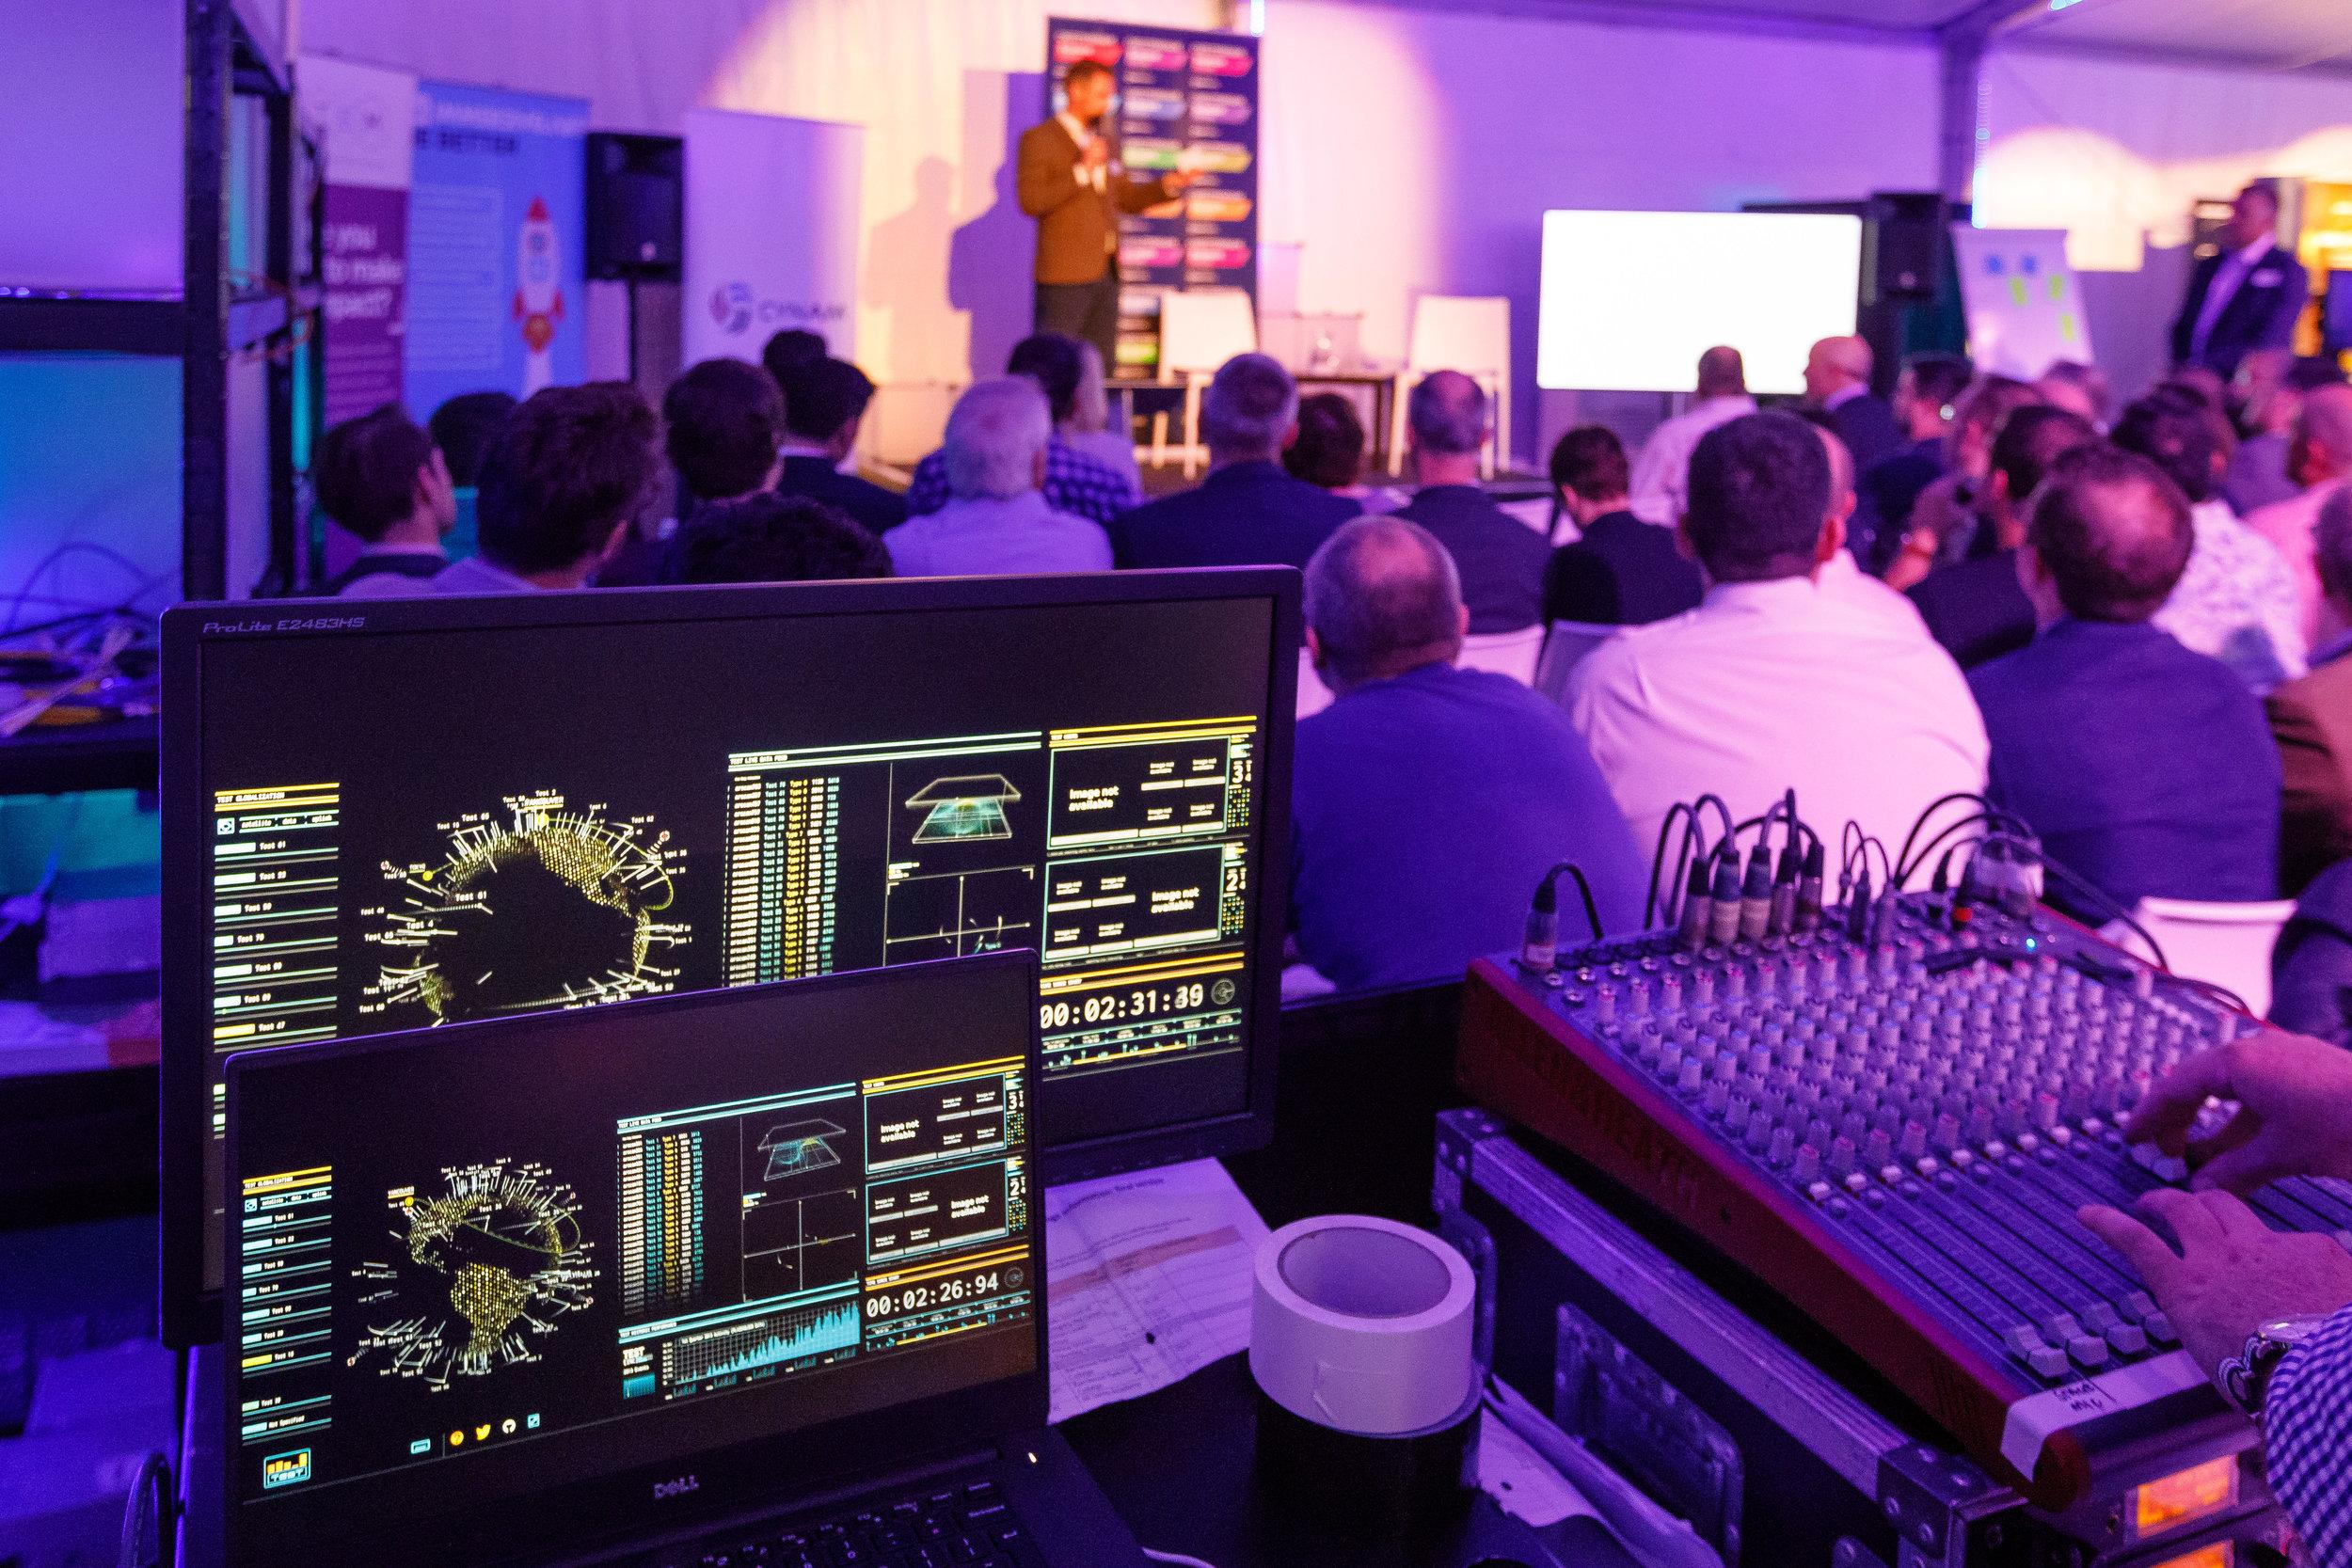 2018.06.08-CyNam-Cheltenham-Science-Festival-iPlus-0041.jpg